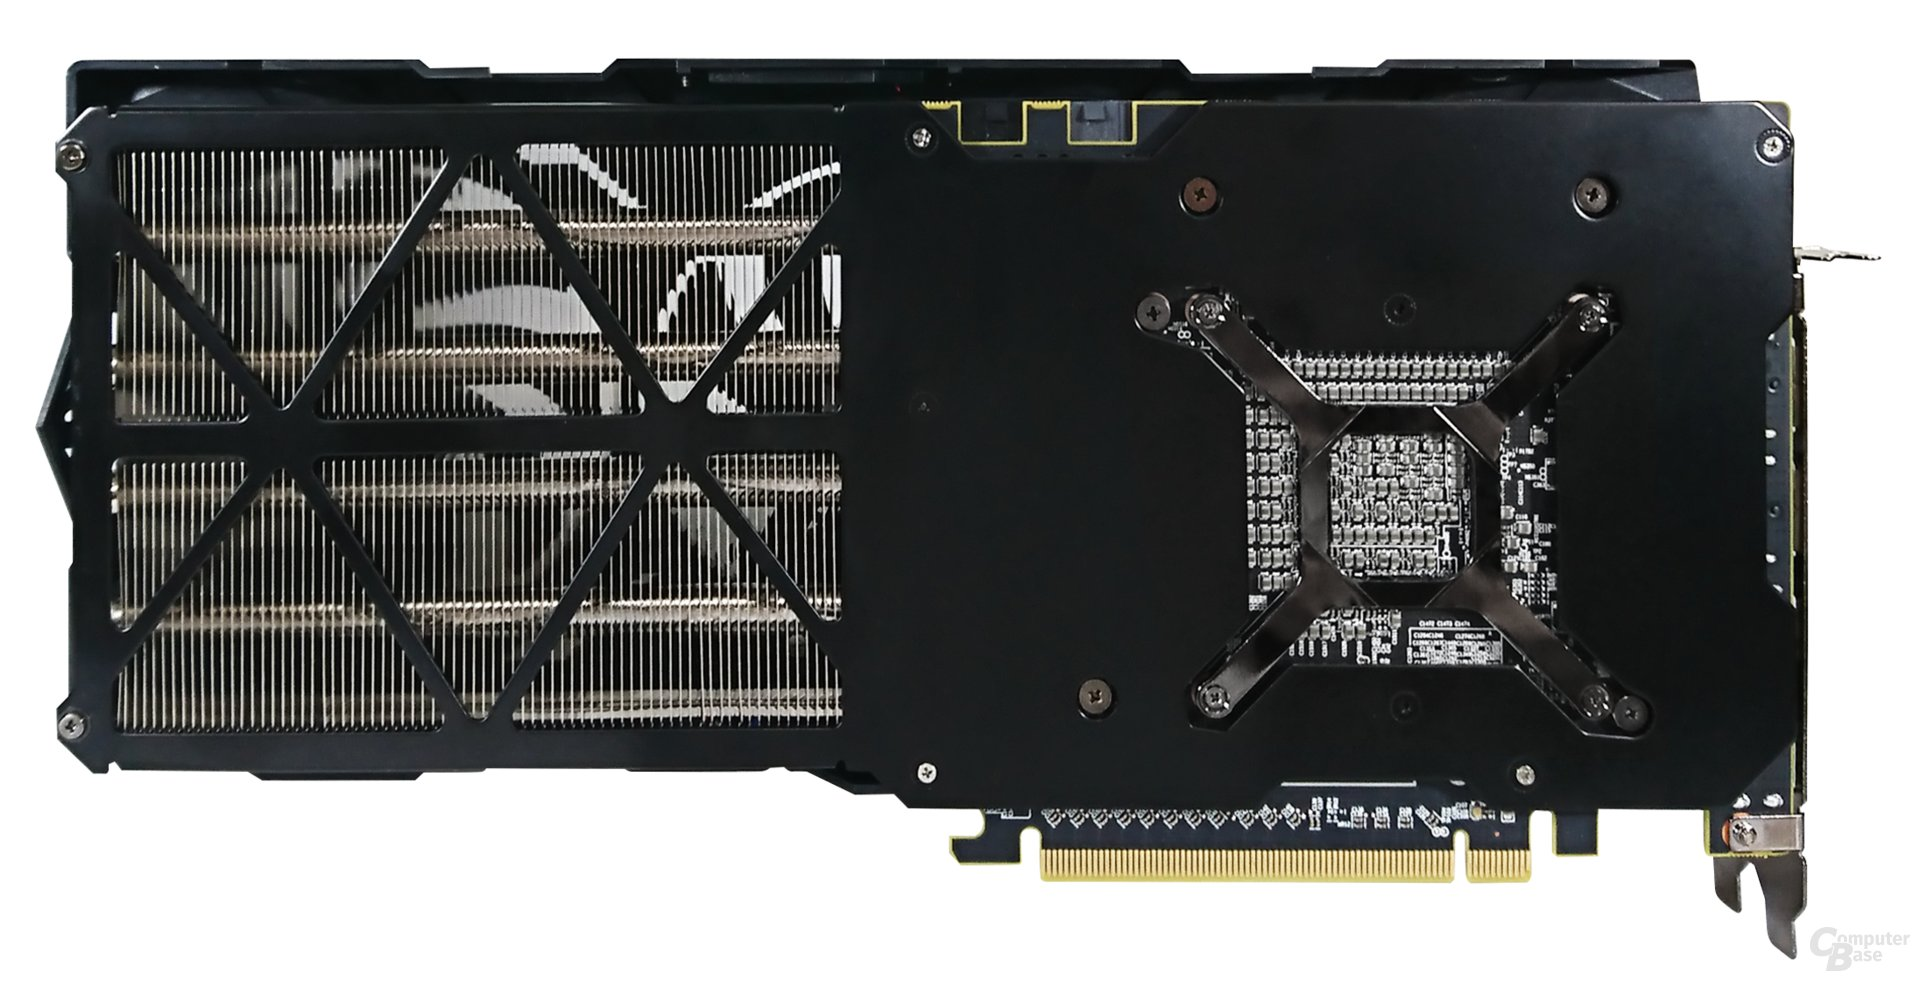 Die Rückseite der PowerColor Radeon RX Vega 56 Red Dragon